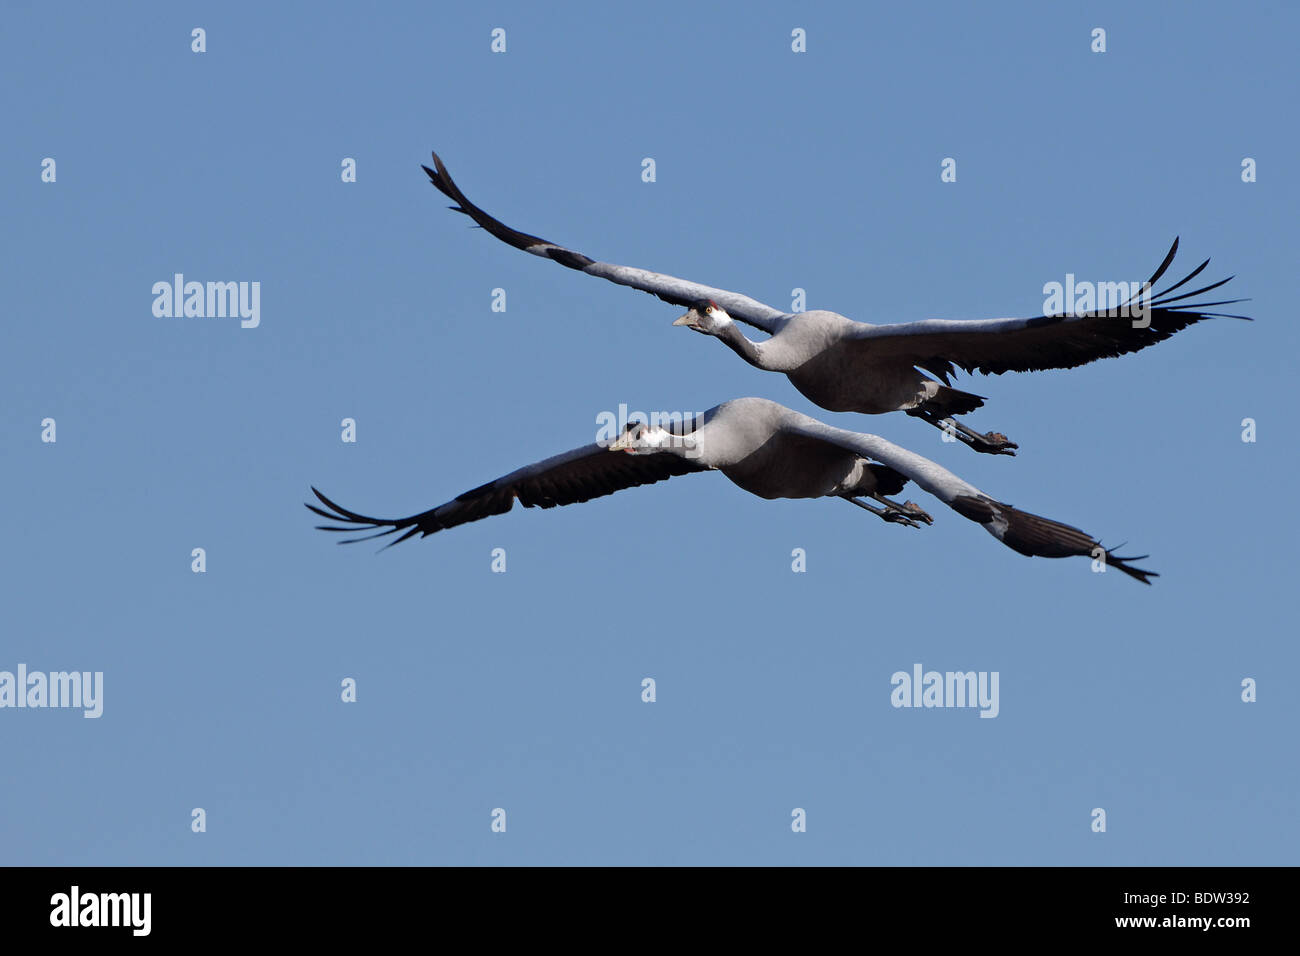 Fliegende Kraniche, flying cranes Stock Photo